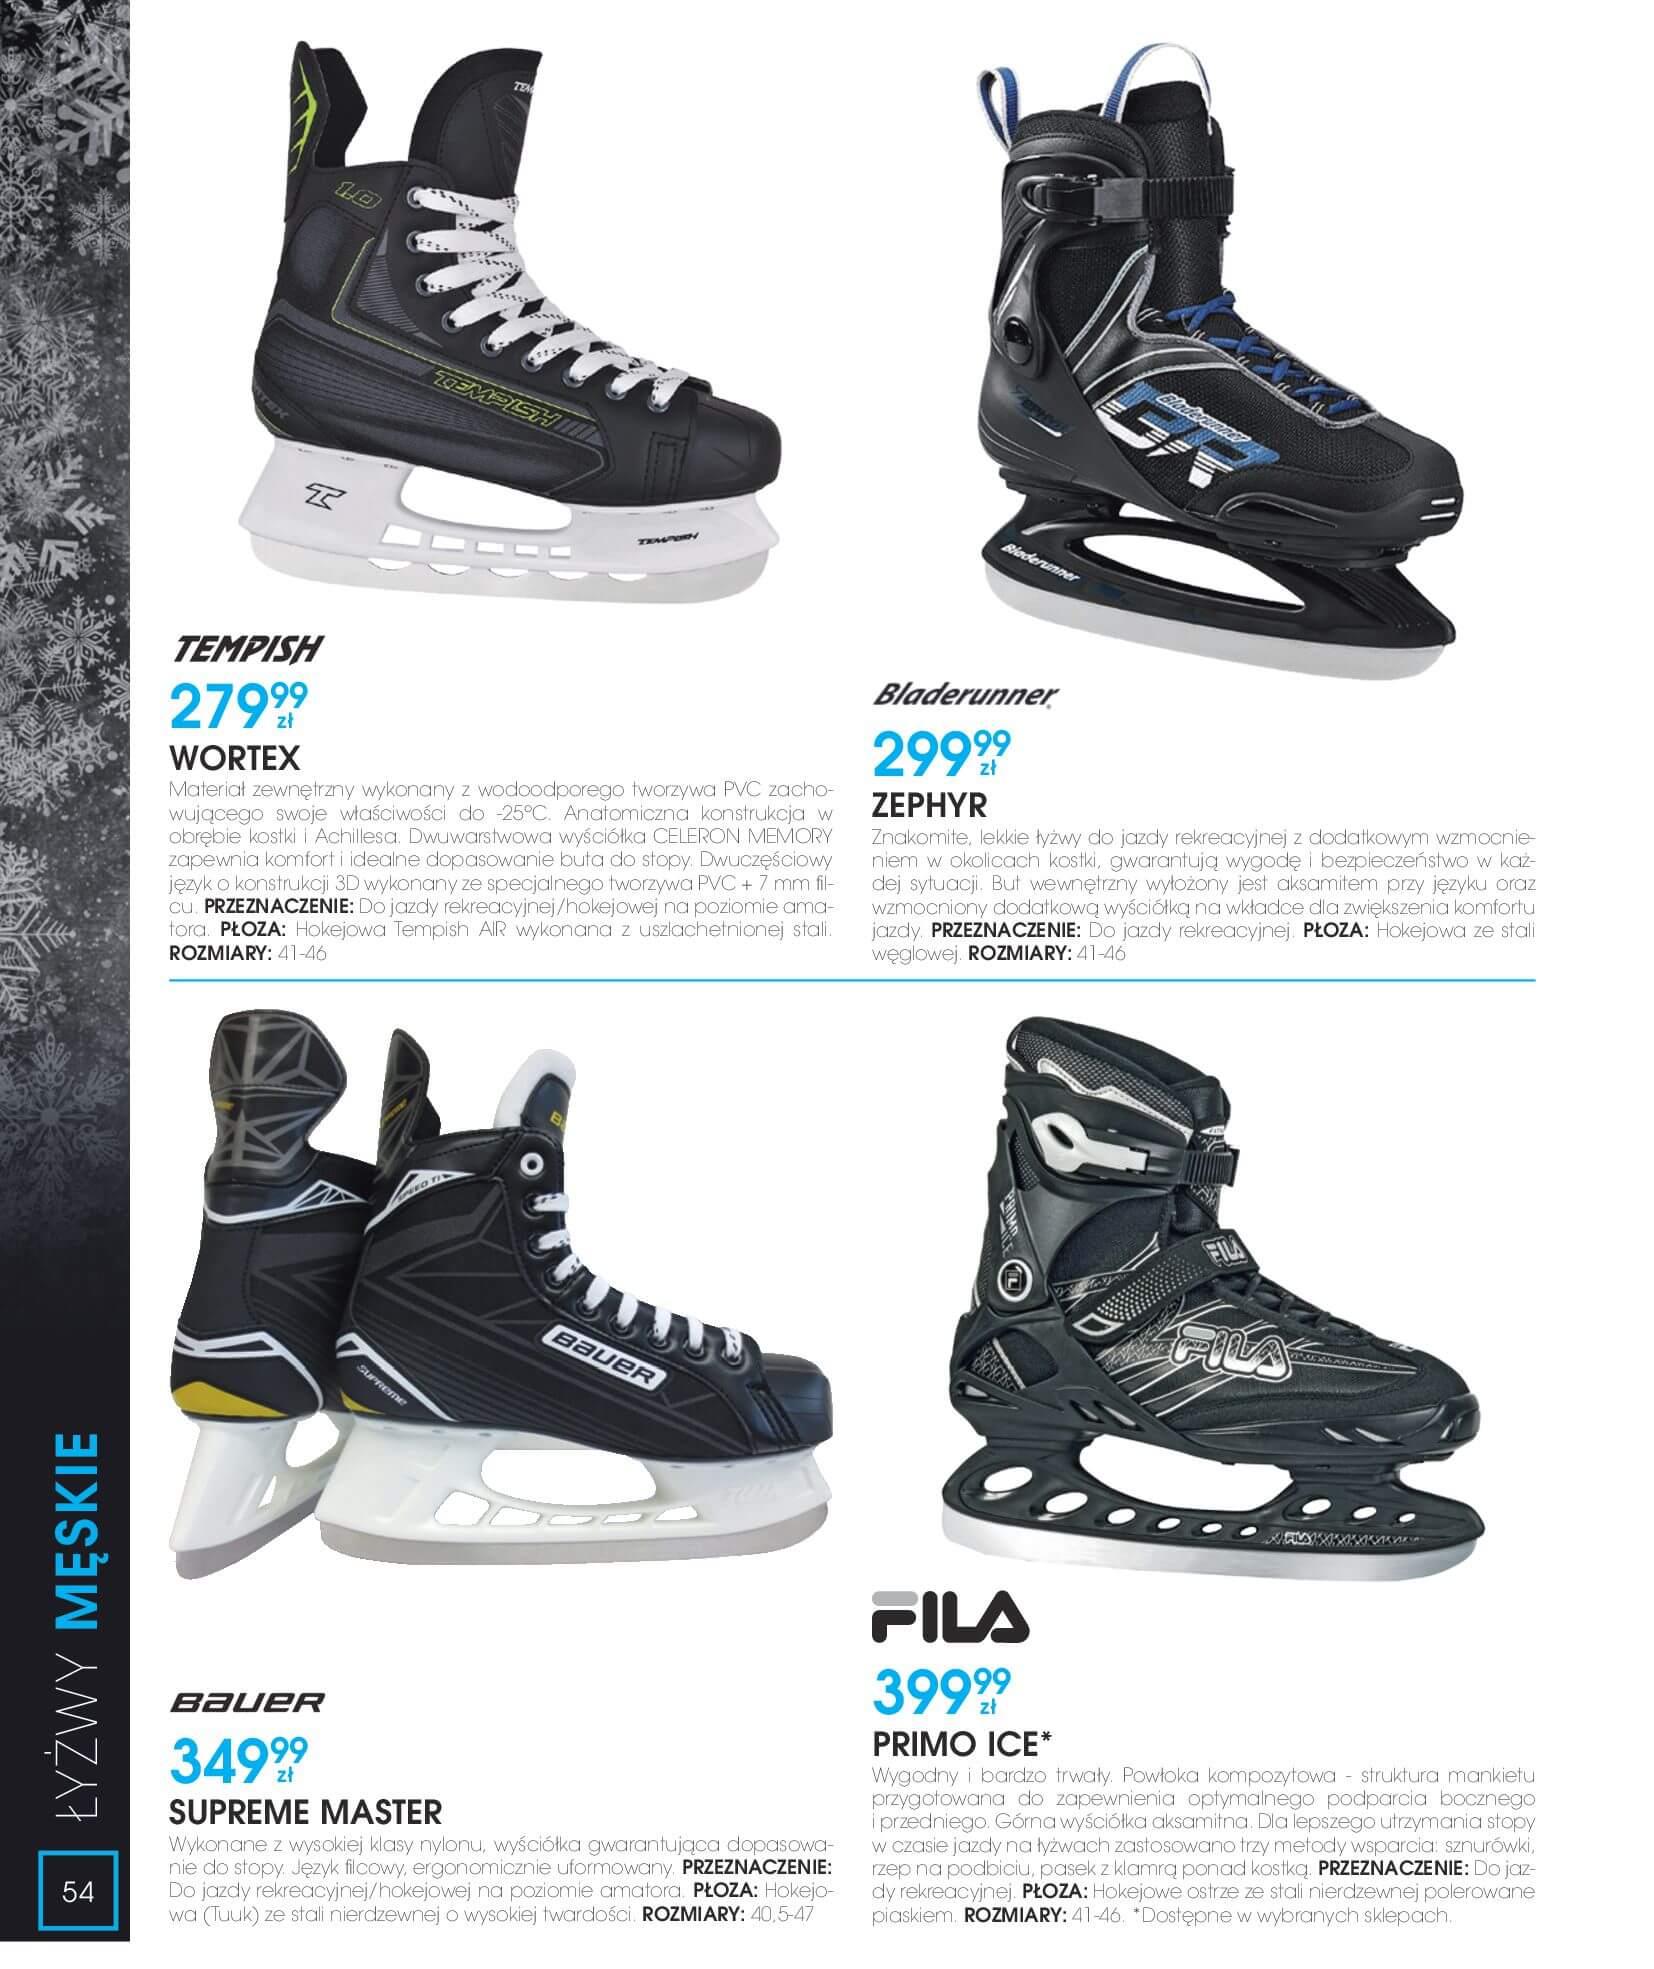 Gazetka Go Sport - Katalog Zima 2017/2018-12.11.2017-28.02.2018-page-54